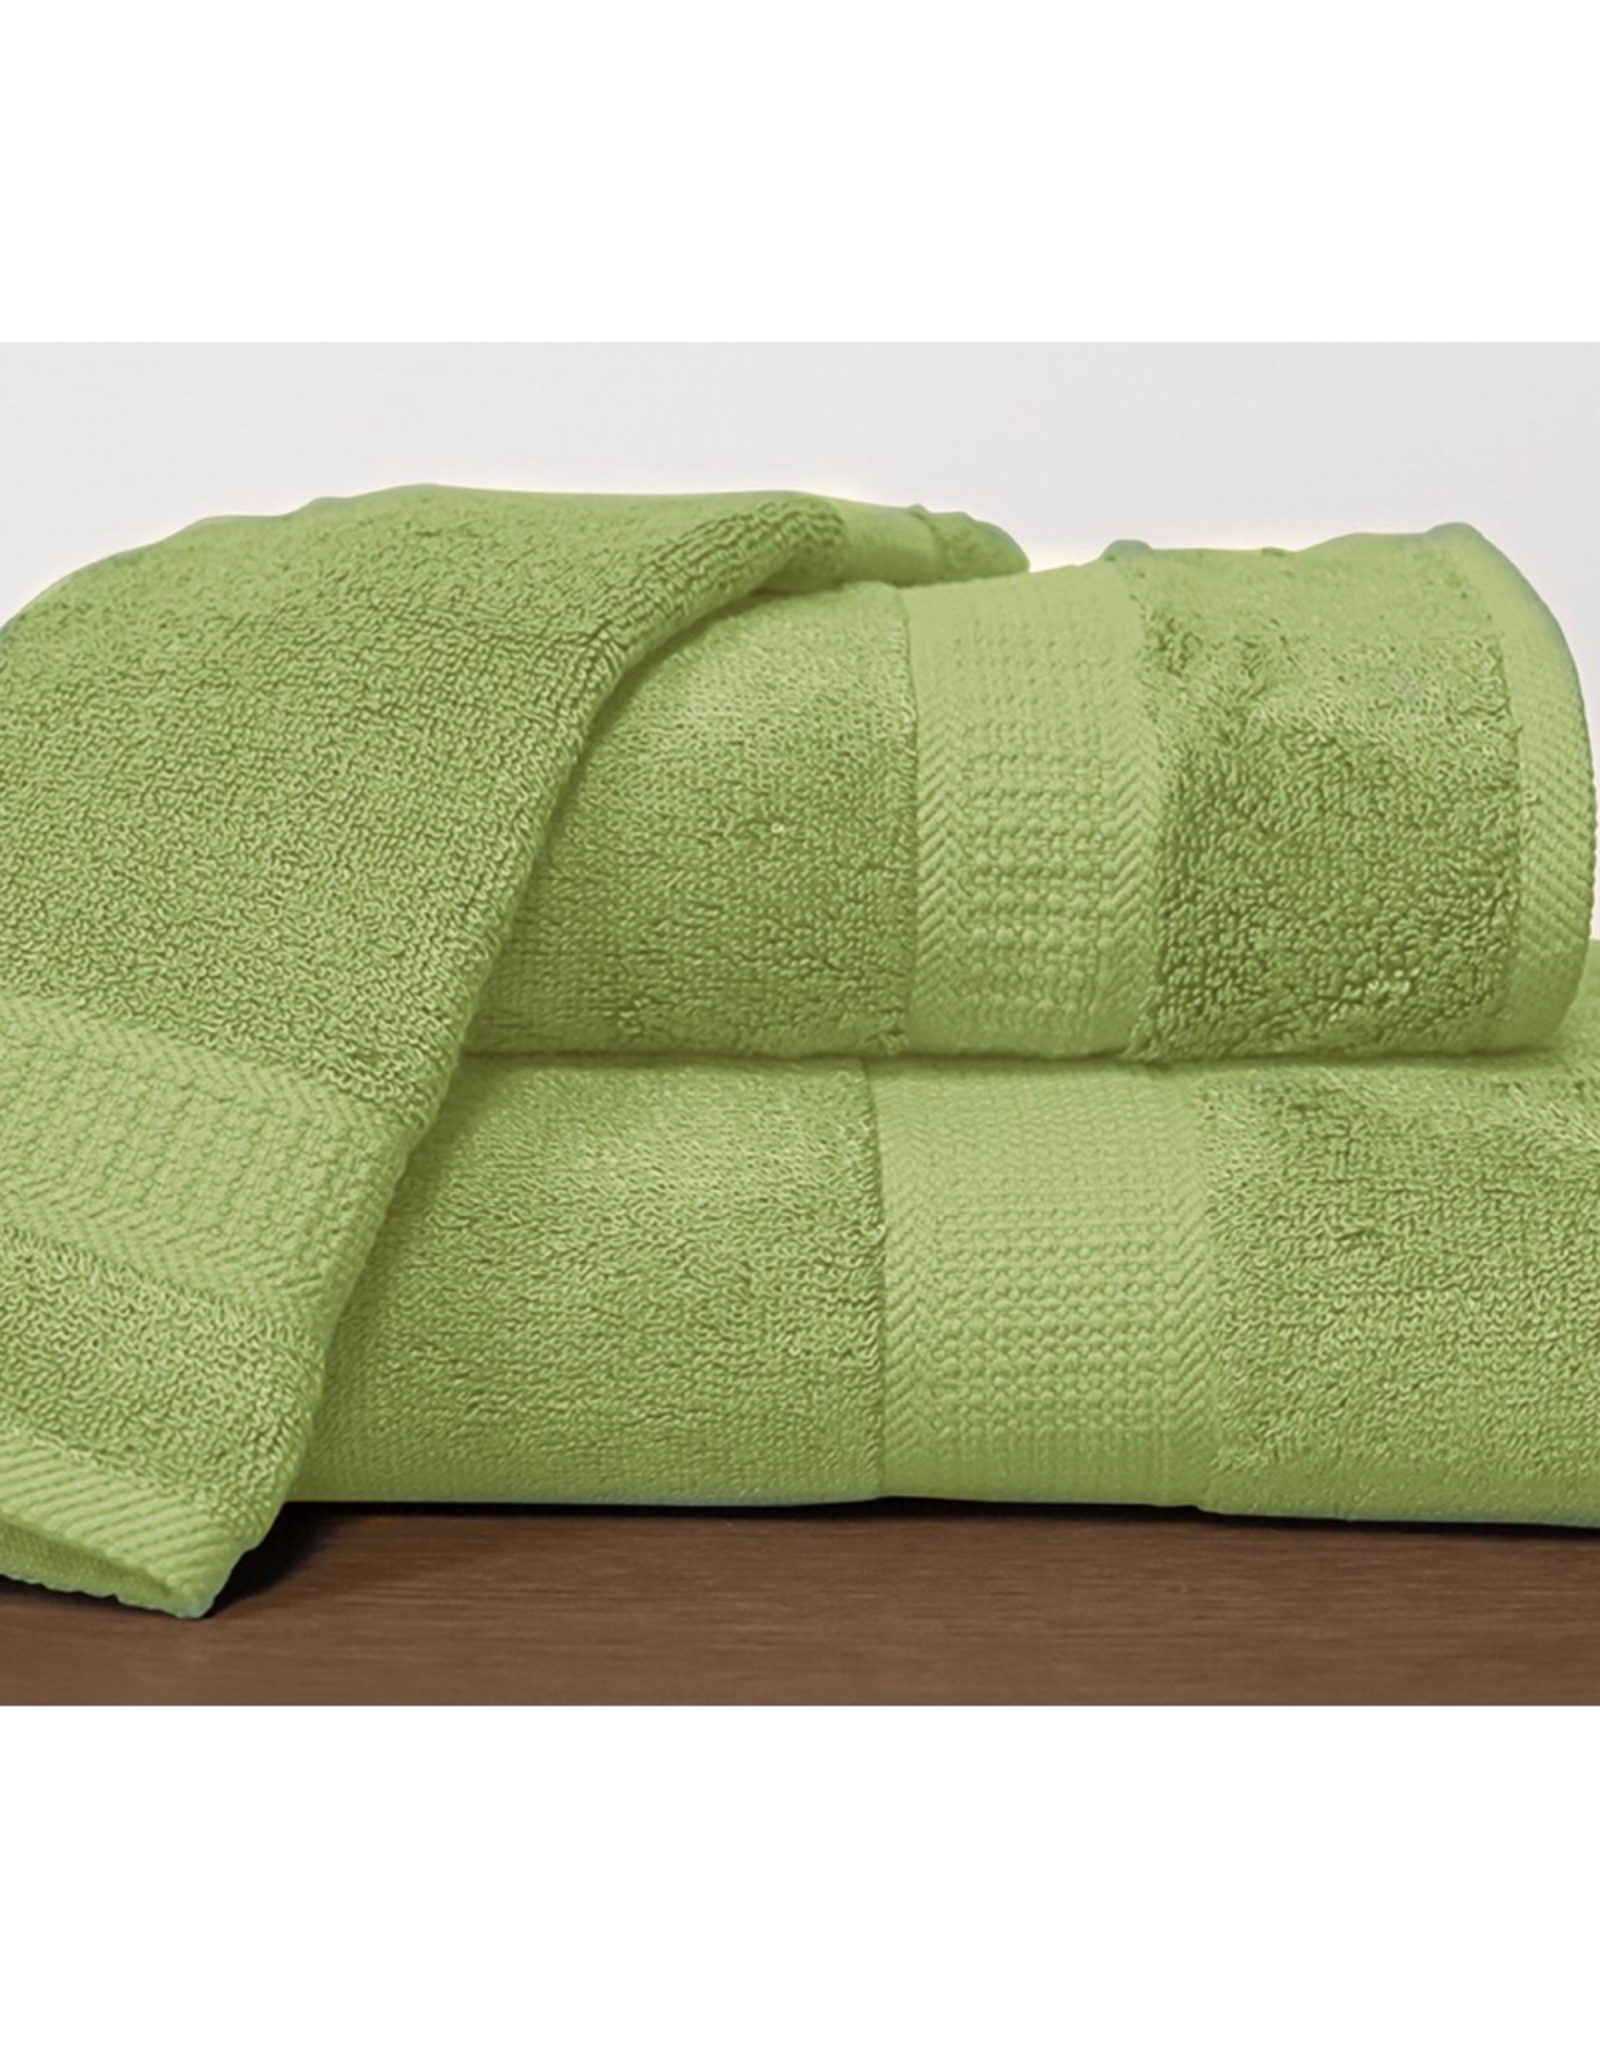 Alamode Home Hand Towel RJS Bamboo Pine Green